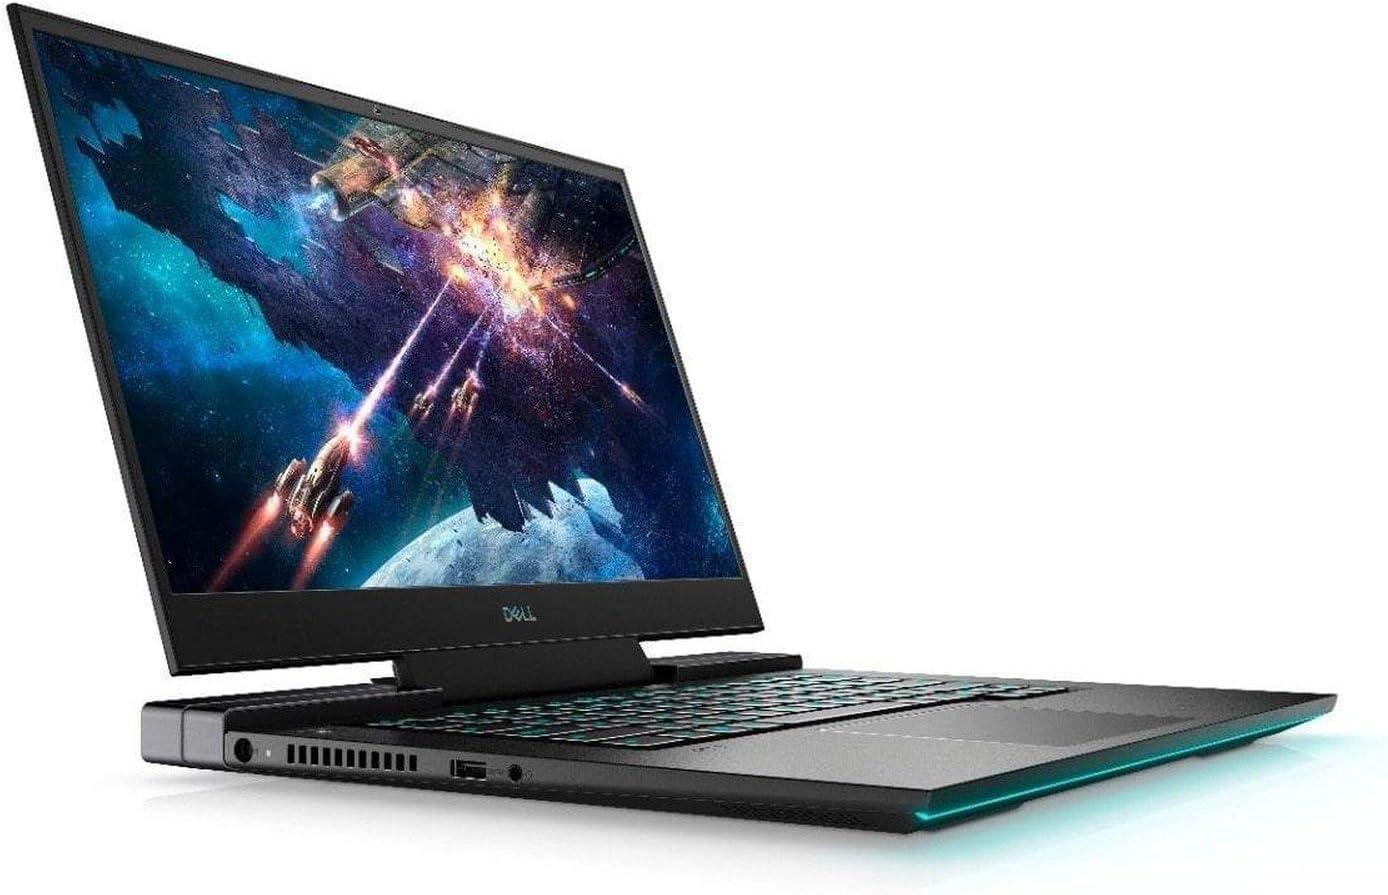 Dell G7 7500 Laptop 15.6 - Intel Core i7 10th Gen - i7-10750H - Six Core 5Ghz - 512GB SSD - 16GB RAM - Nvidia GeForce GTX 1660 Ti - 1920x1080 FHD - Windows 10 Home